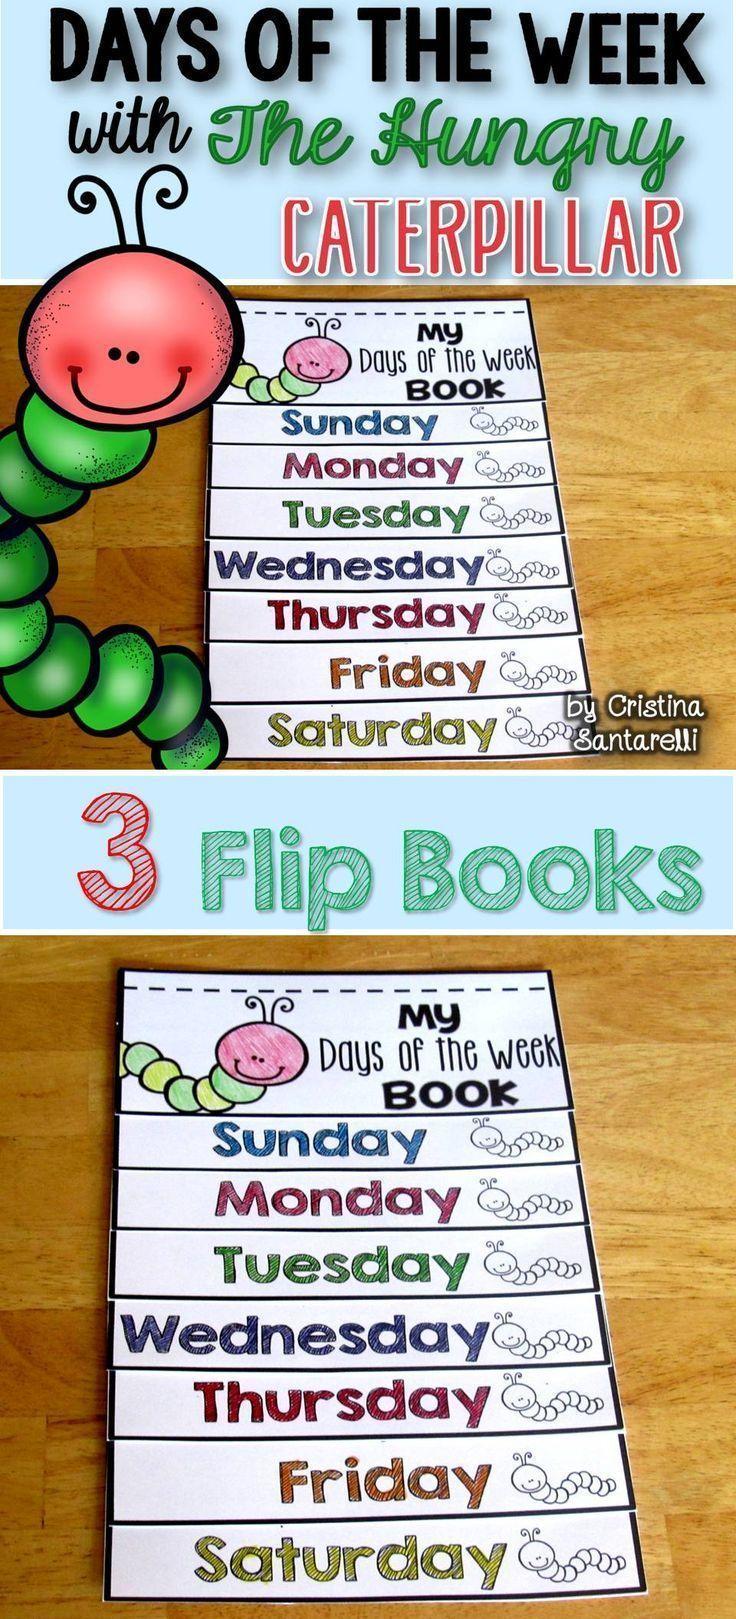 Days of the week flip book   Hungry caterpillar activities ...